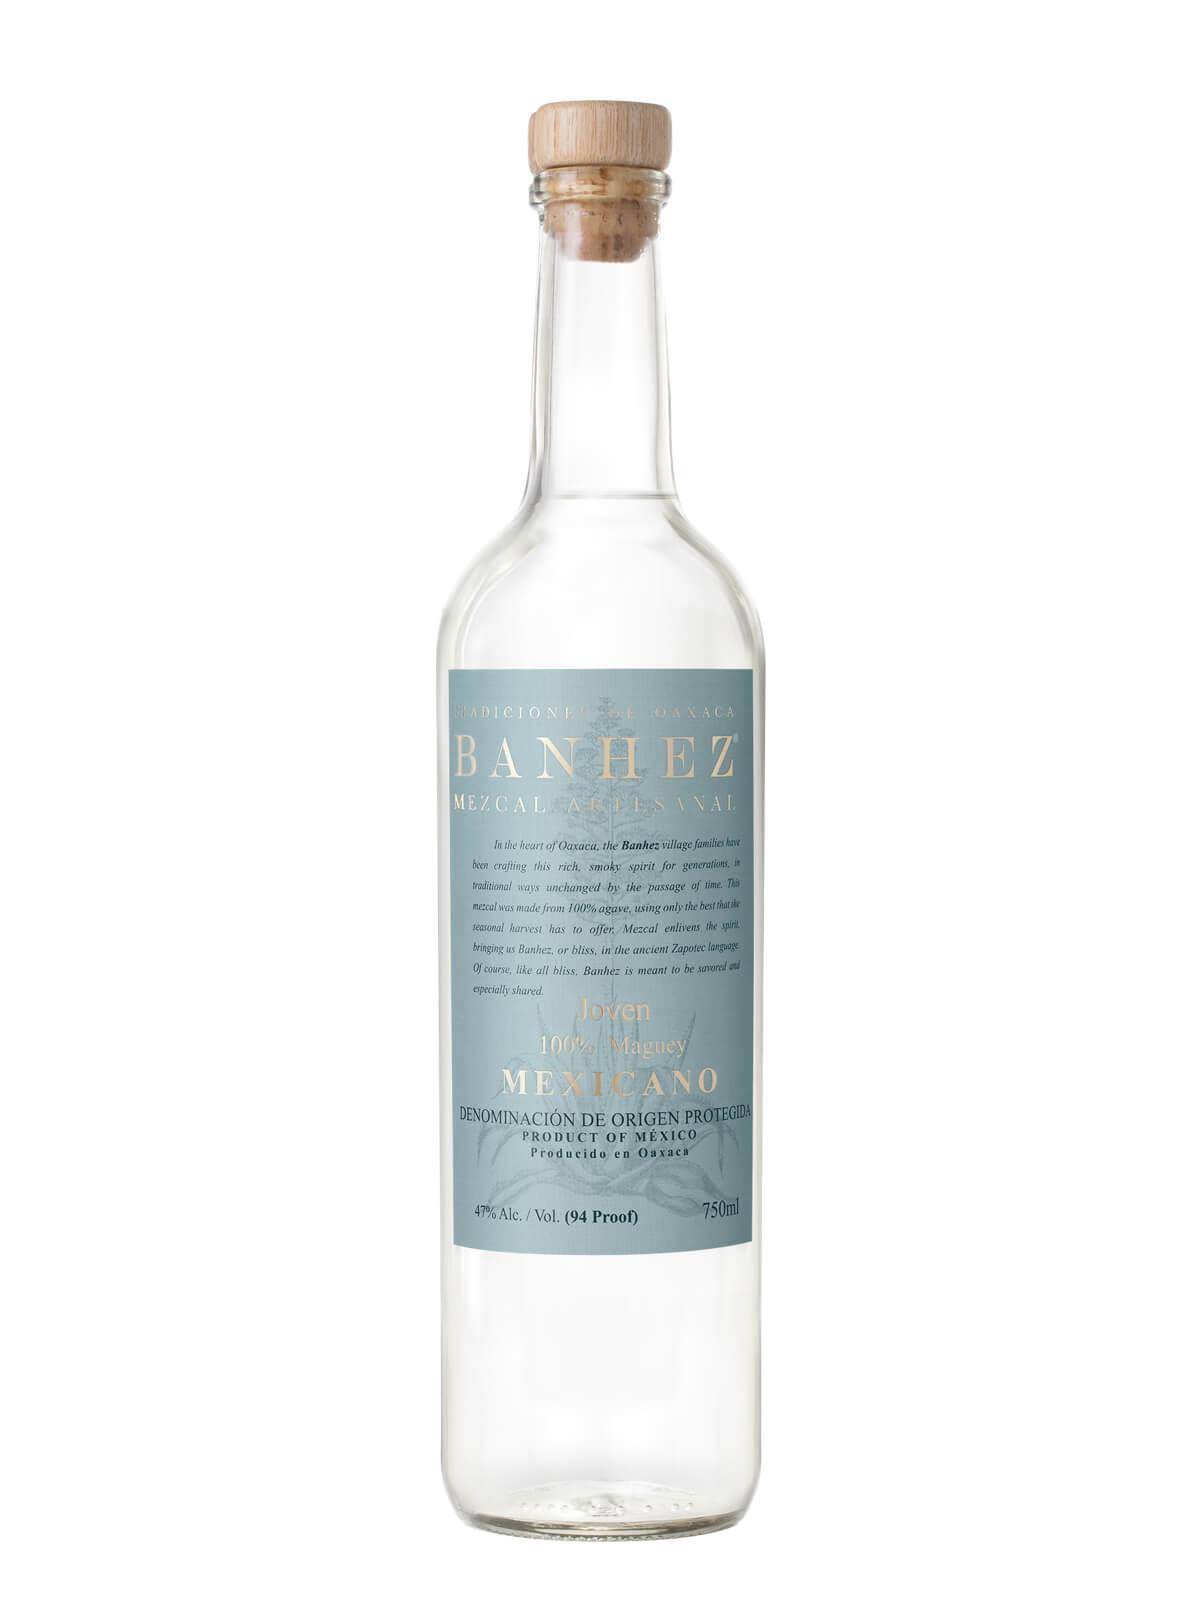 Banhez Mezcal Mexicano bottle